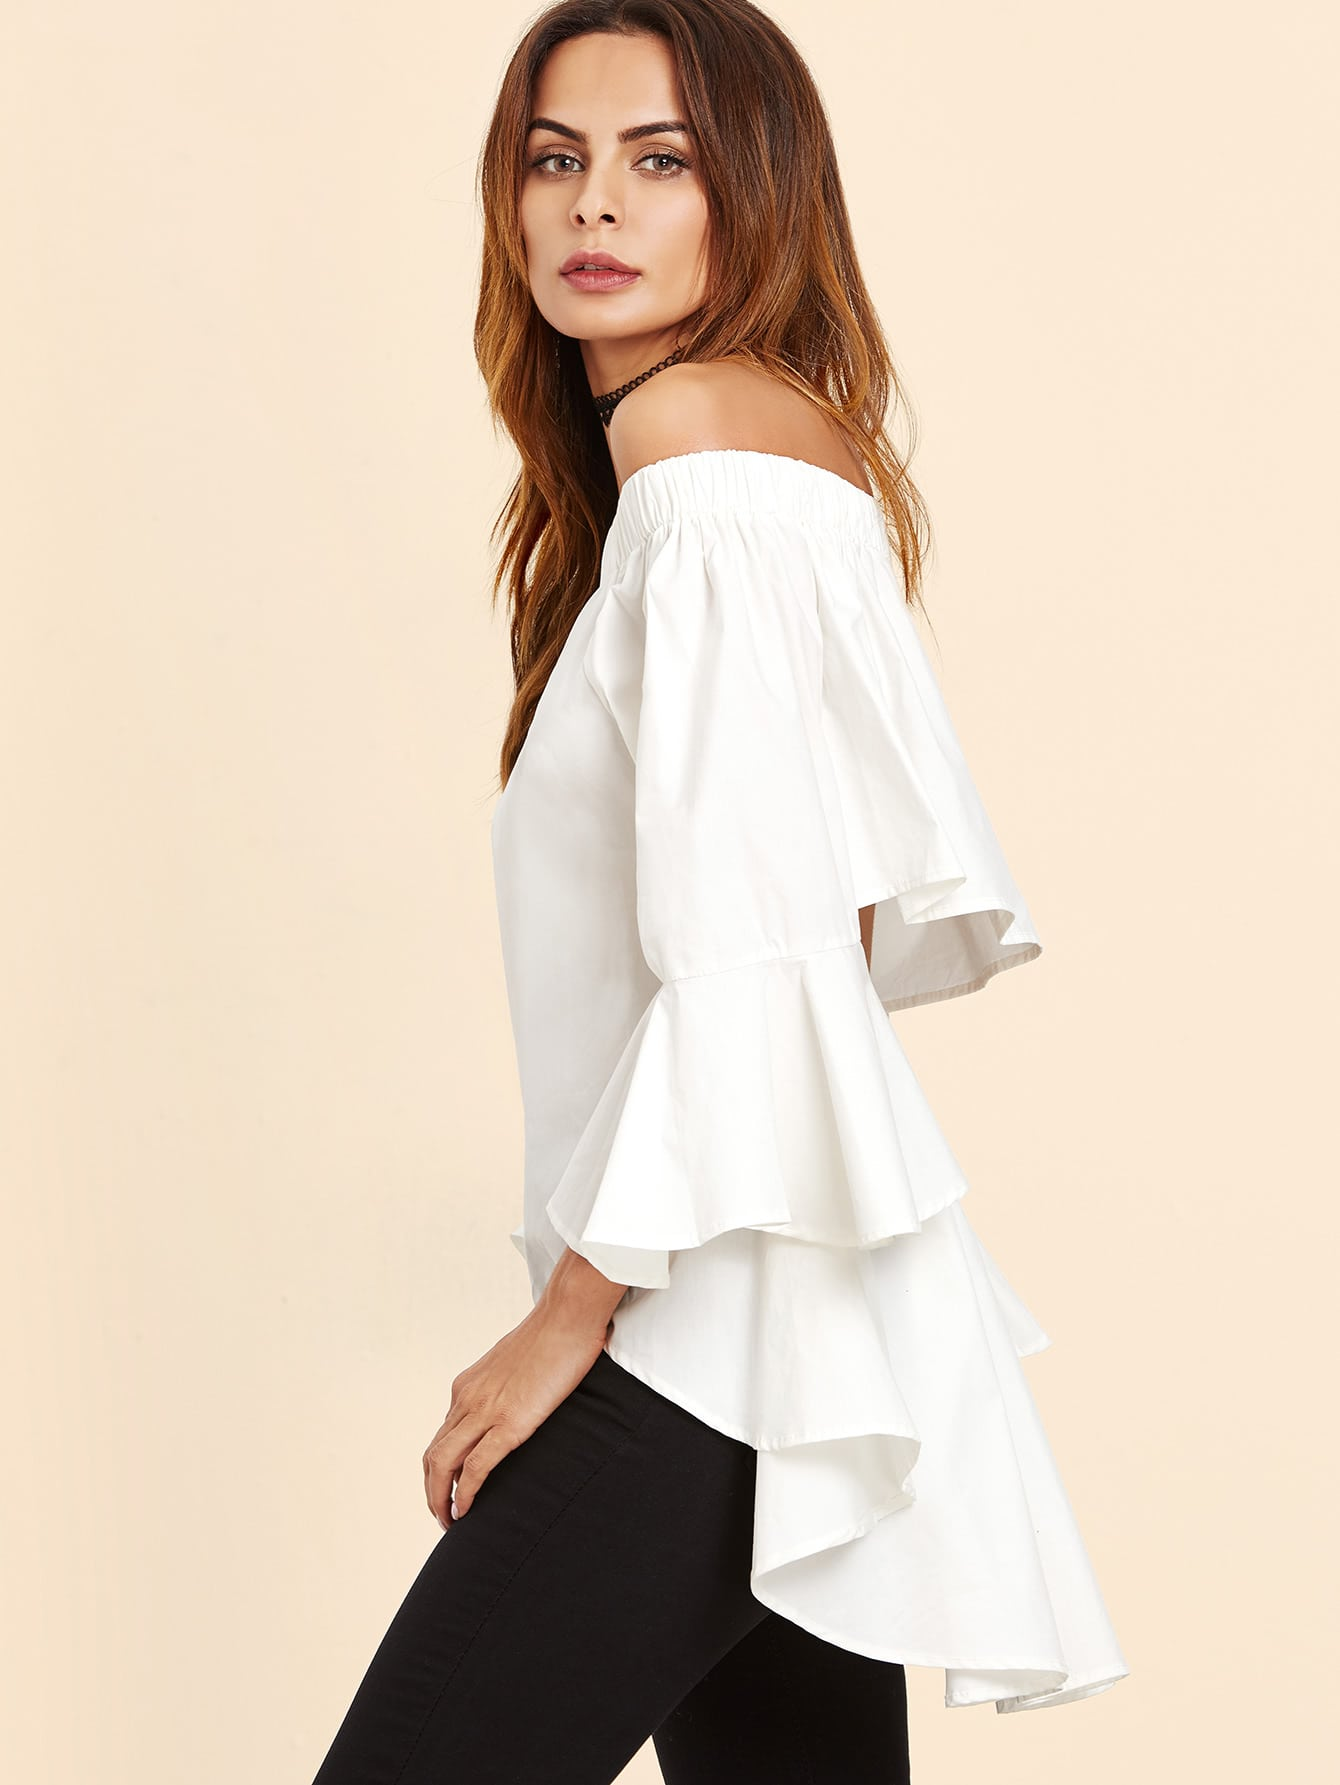 blouse161025031_2